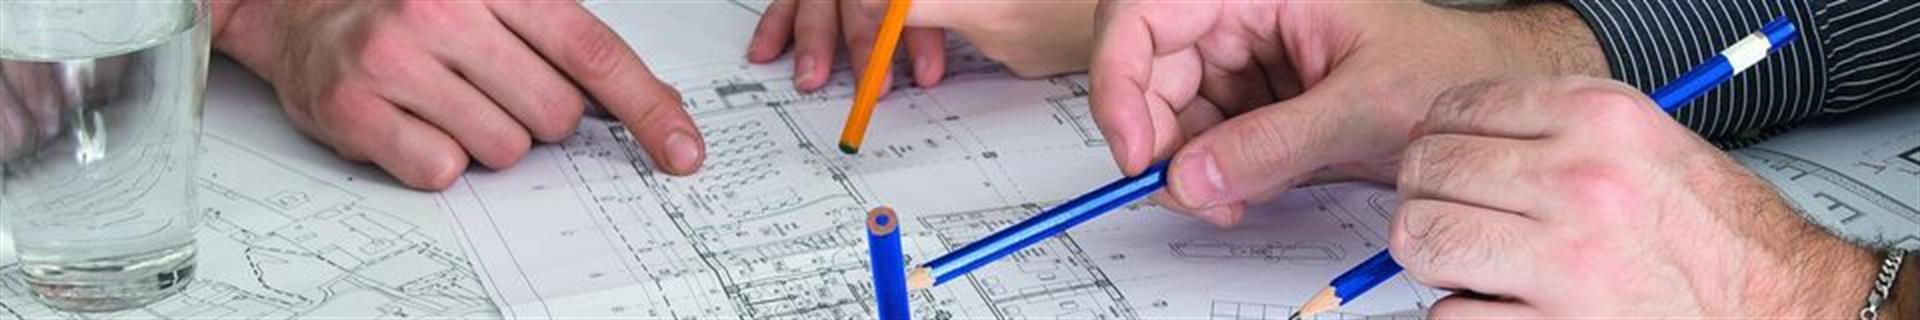 https://assets.master-builders-solutions.com/fr-fr/crayon_basf_architecte.jpg?width=1920